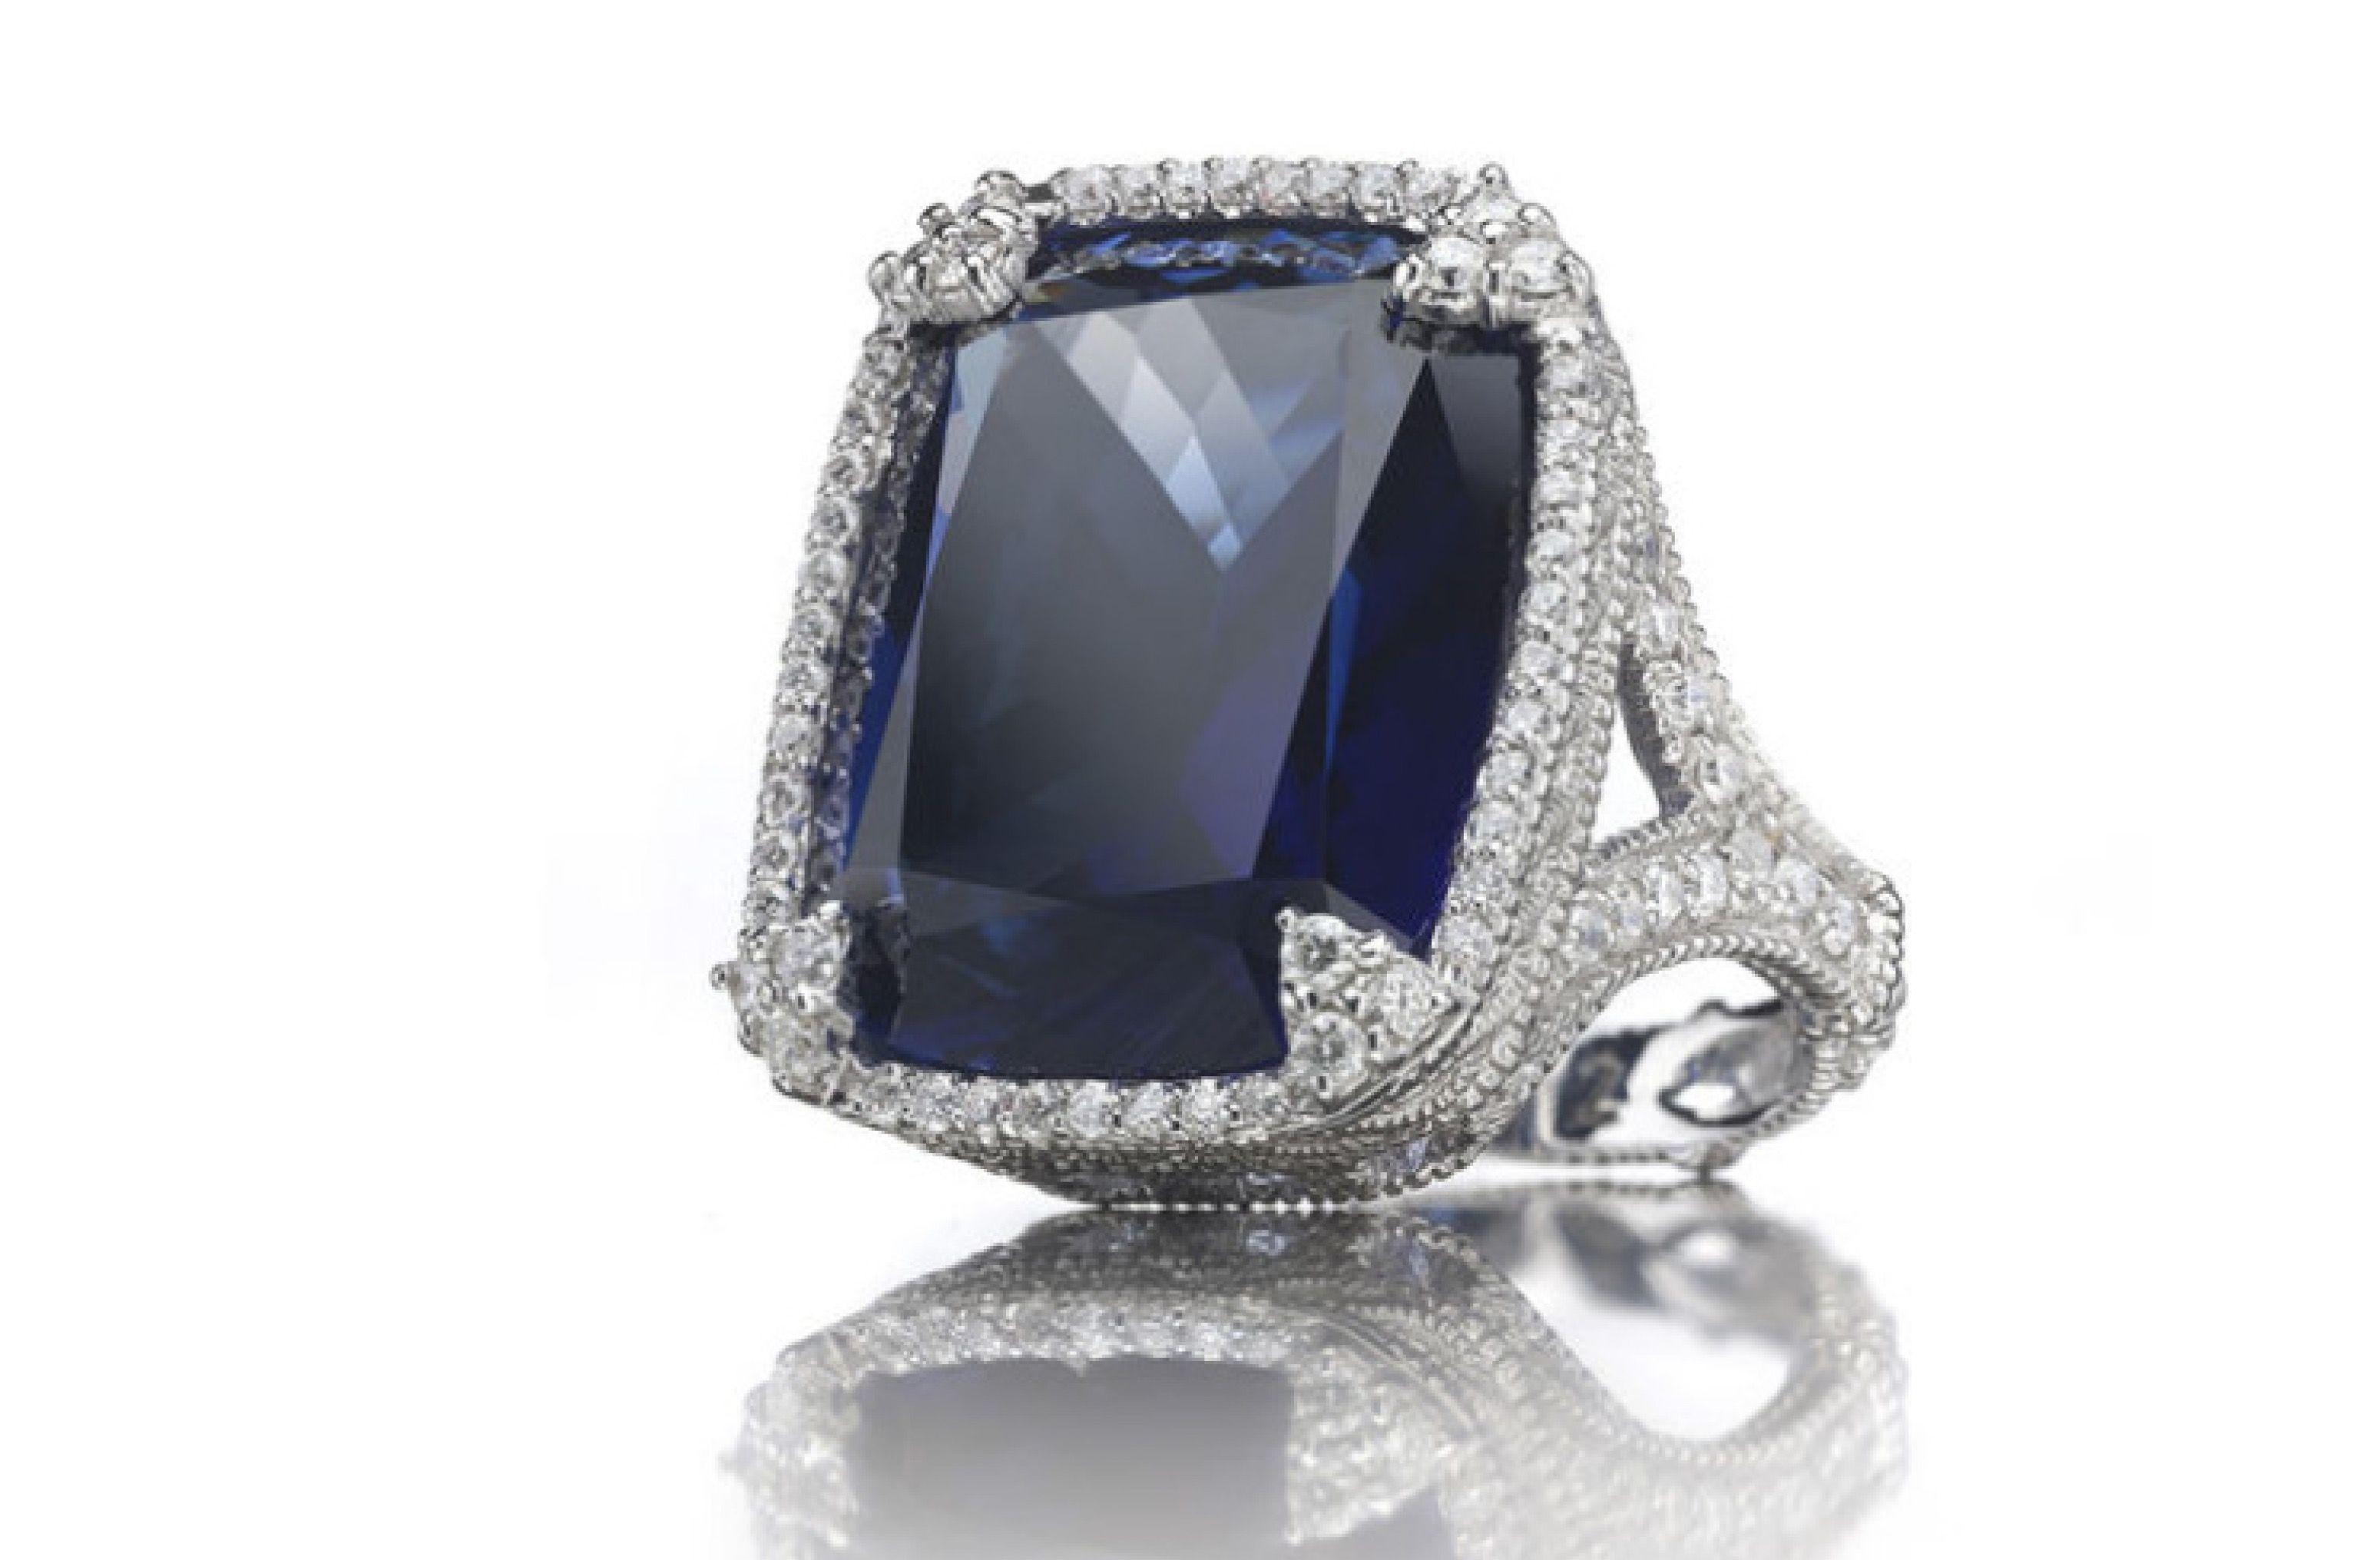 JewelryWhite_31.jpg